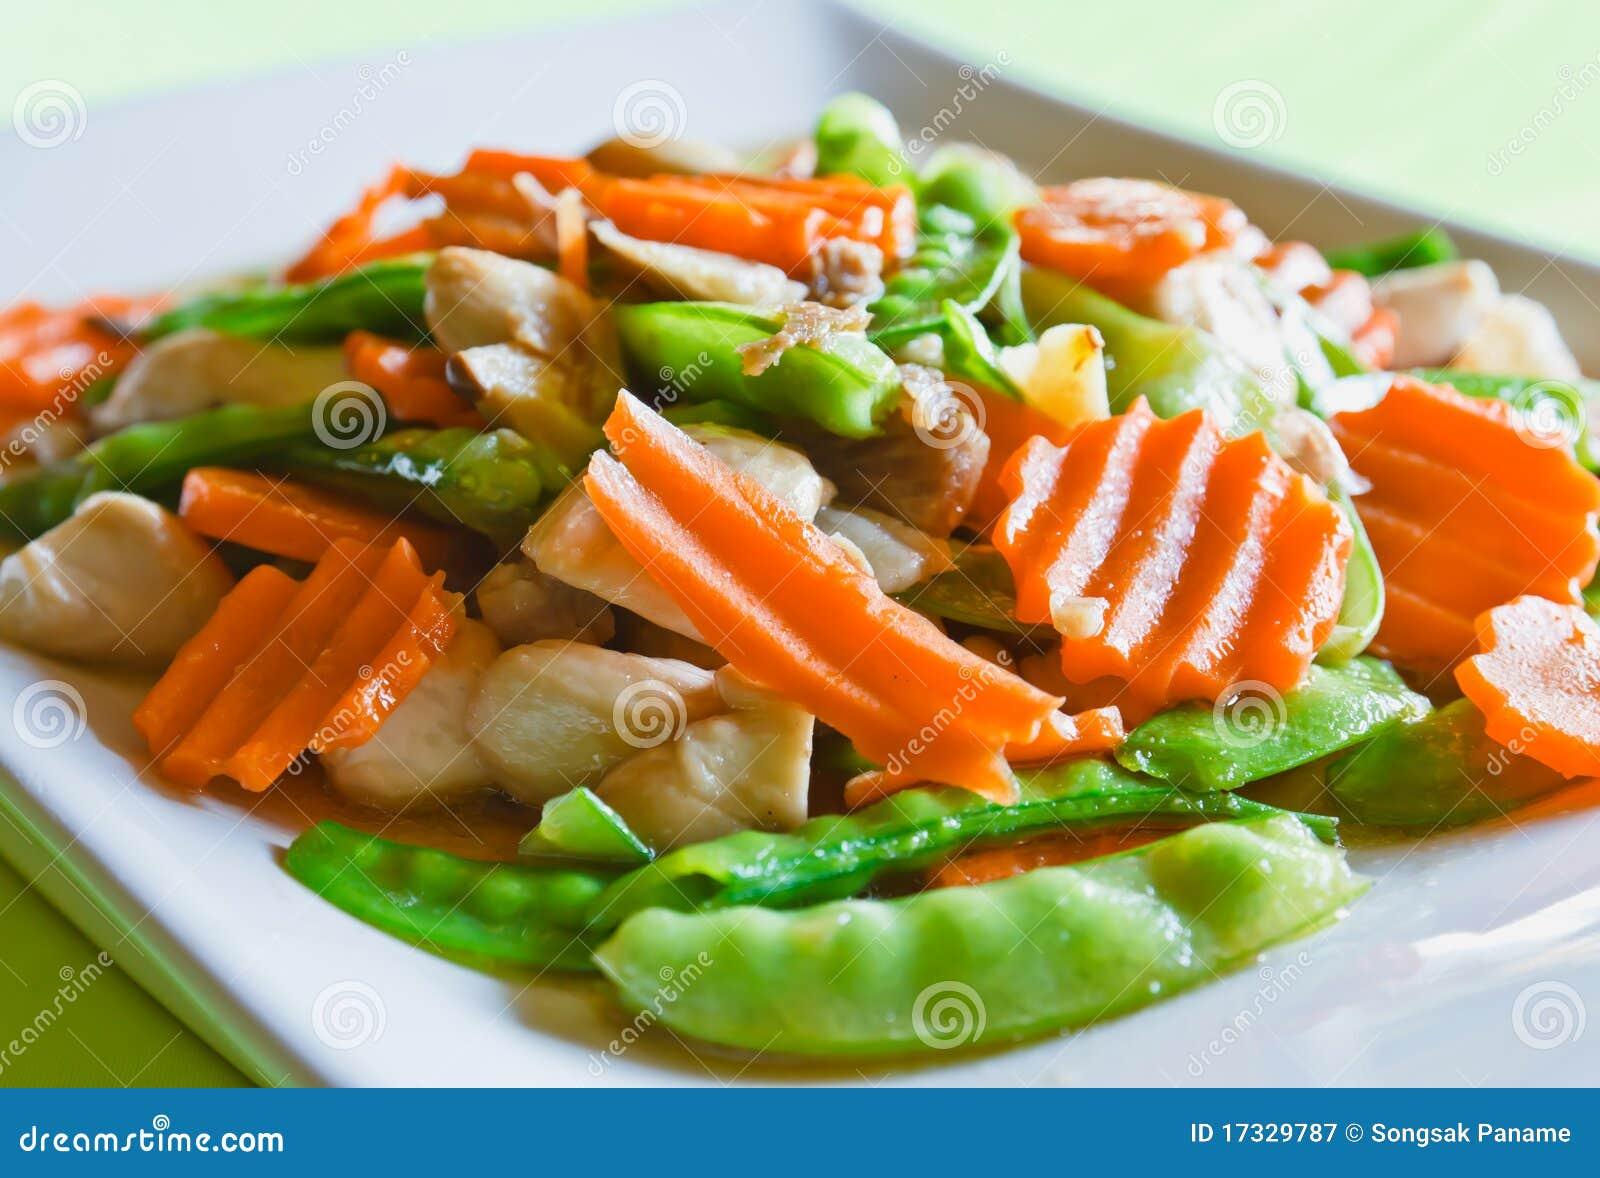 Thai cuisine royalty free stock photography image 17329787 for Cuisine thai